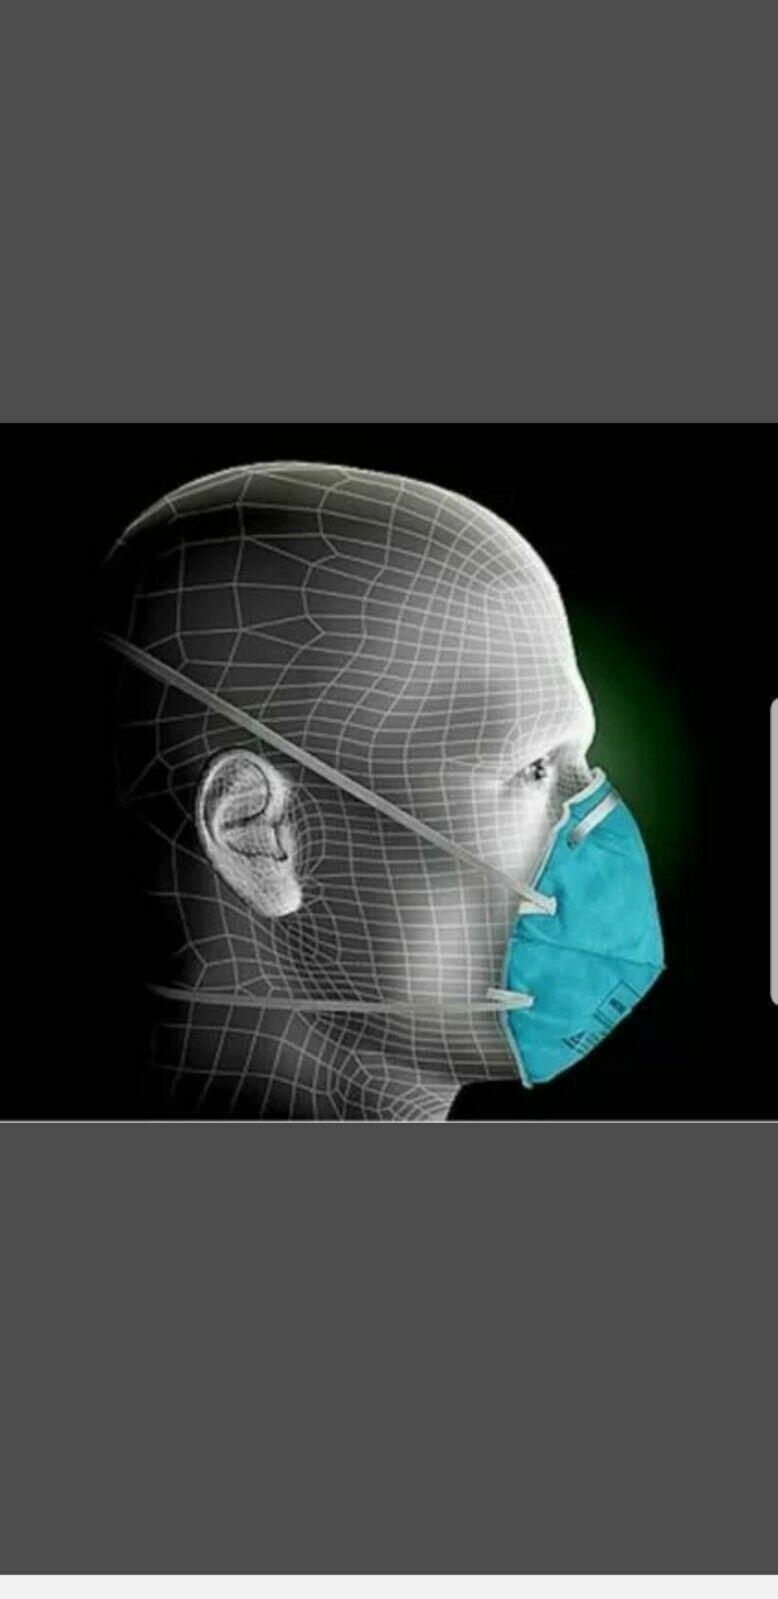 3m 1860 n95 medical protective mask in 2020 3m n95 mask